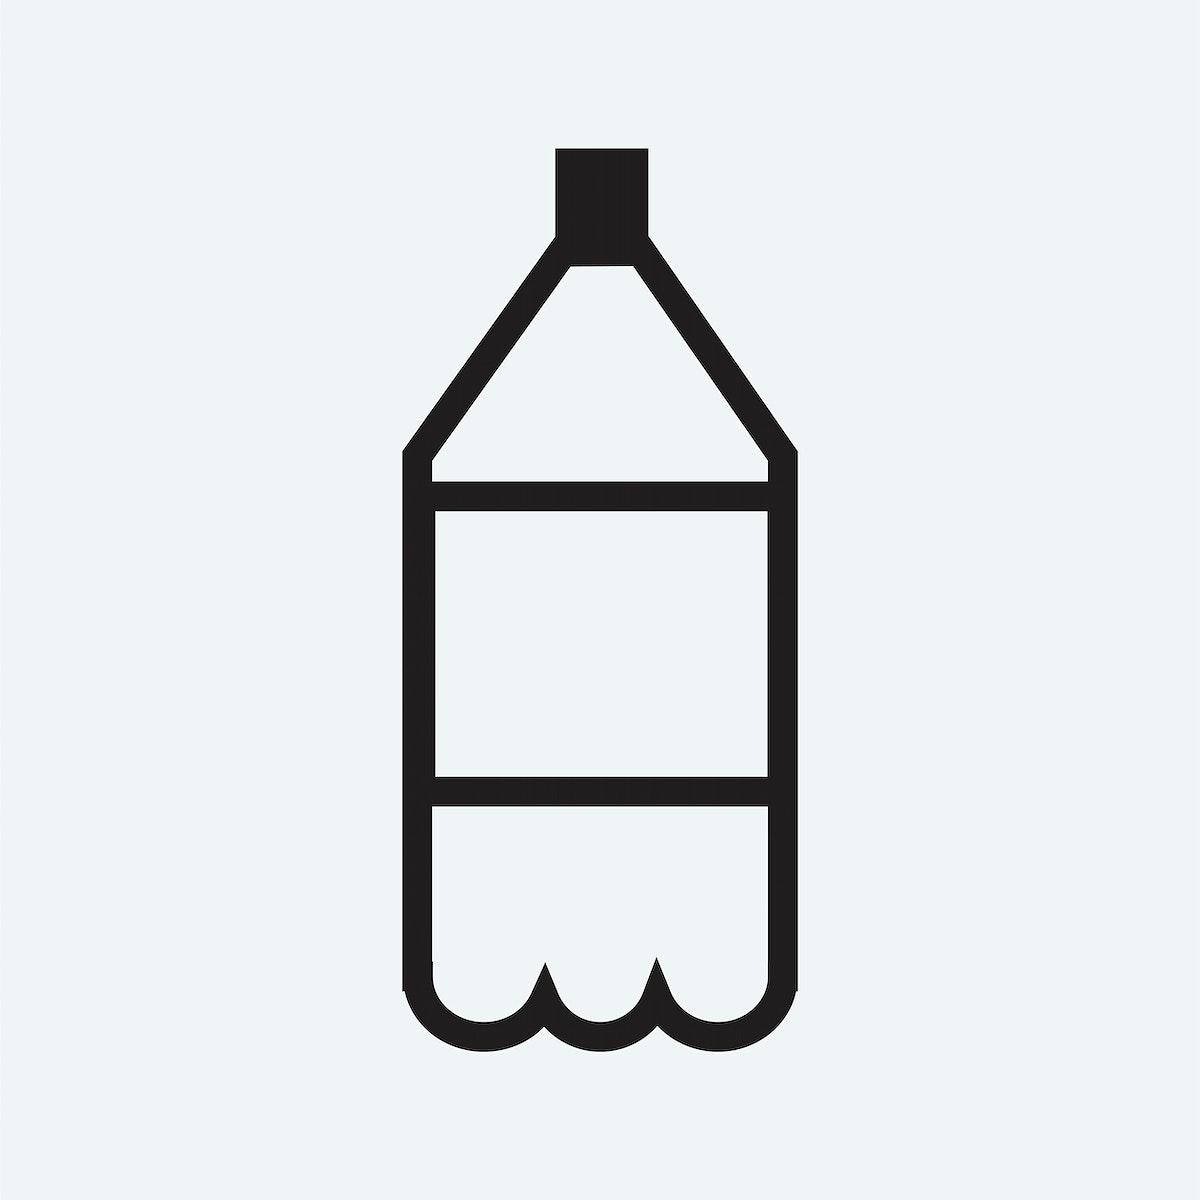 Soft drink plastic bottle icon illustration